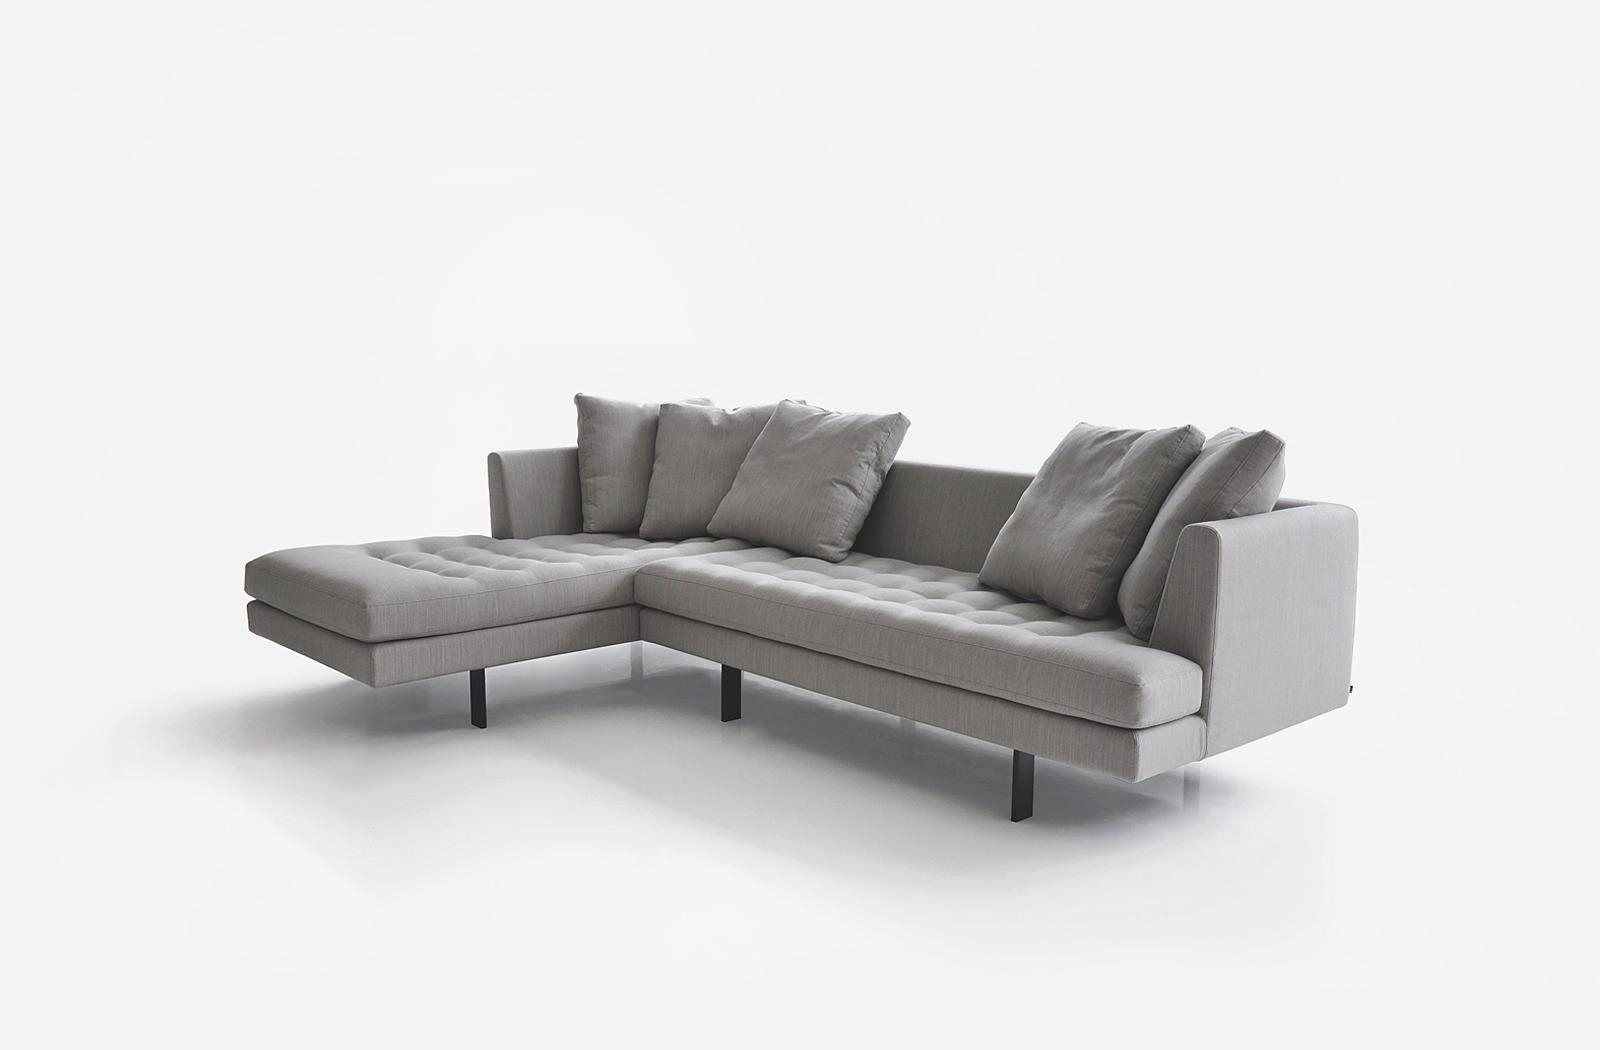 Edward Sectional | Bensen Throughout Bensen Sofas (Image 10 of 20)